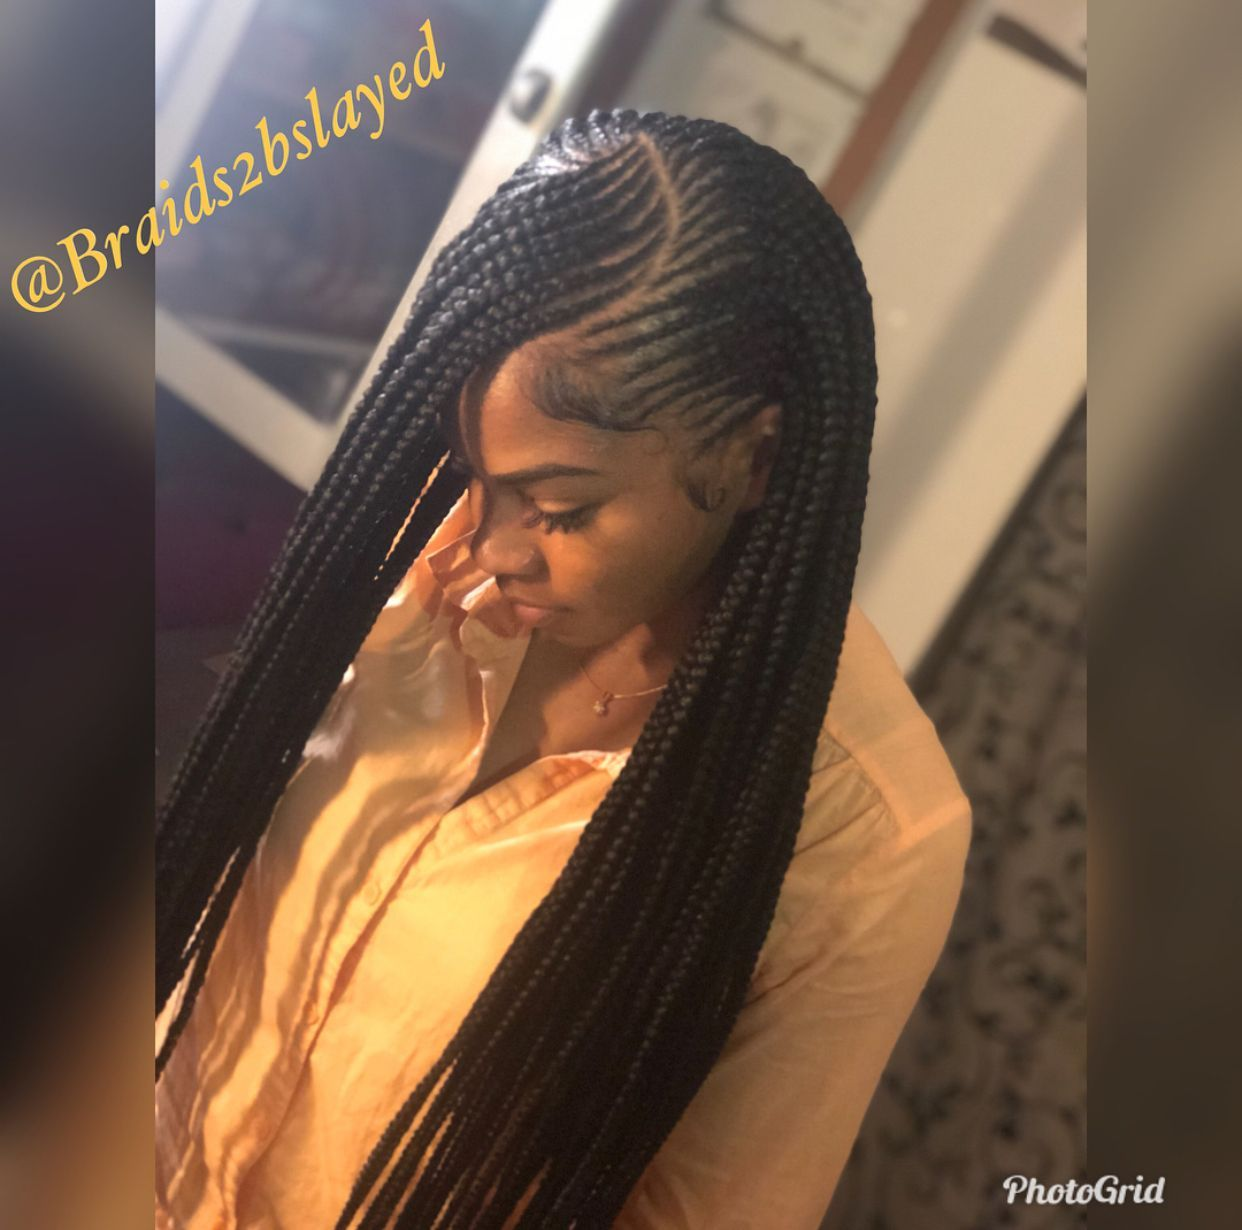 Braids Styles For Black Girls Braided Hairstyles For Black Women Black Girl Braided Hairstyles Hair Styles